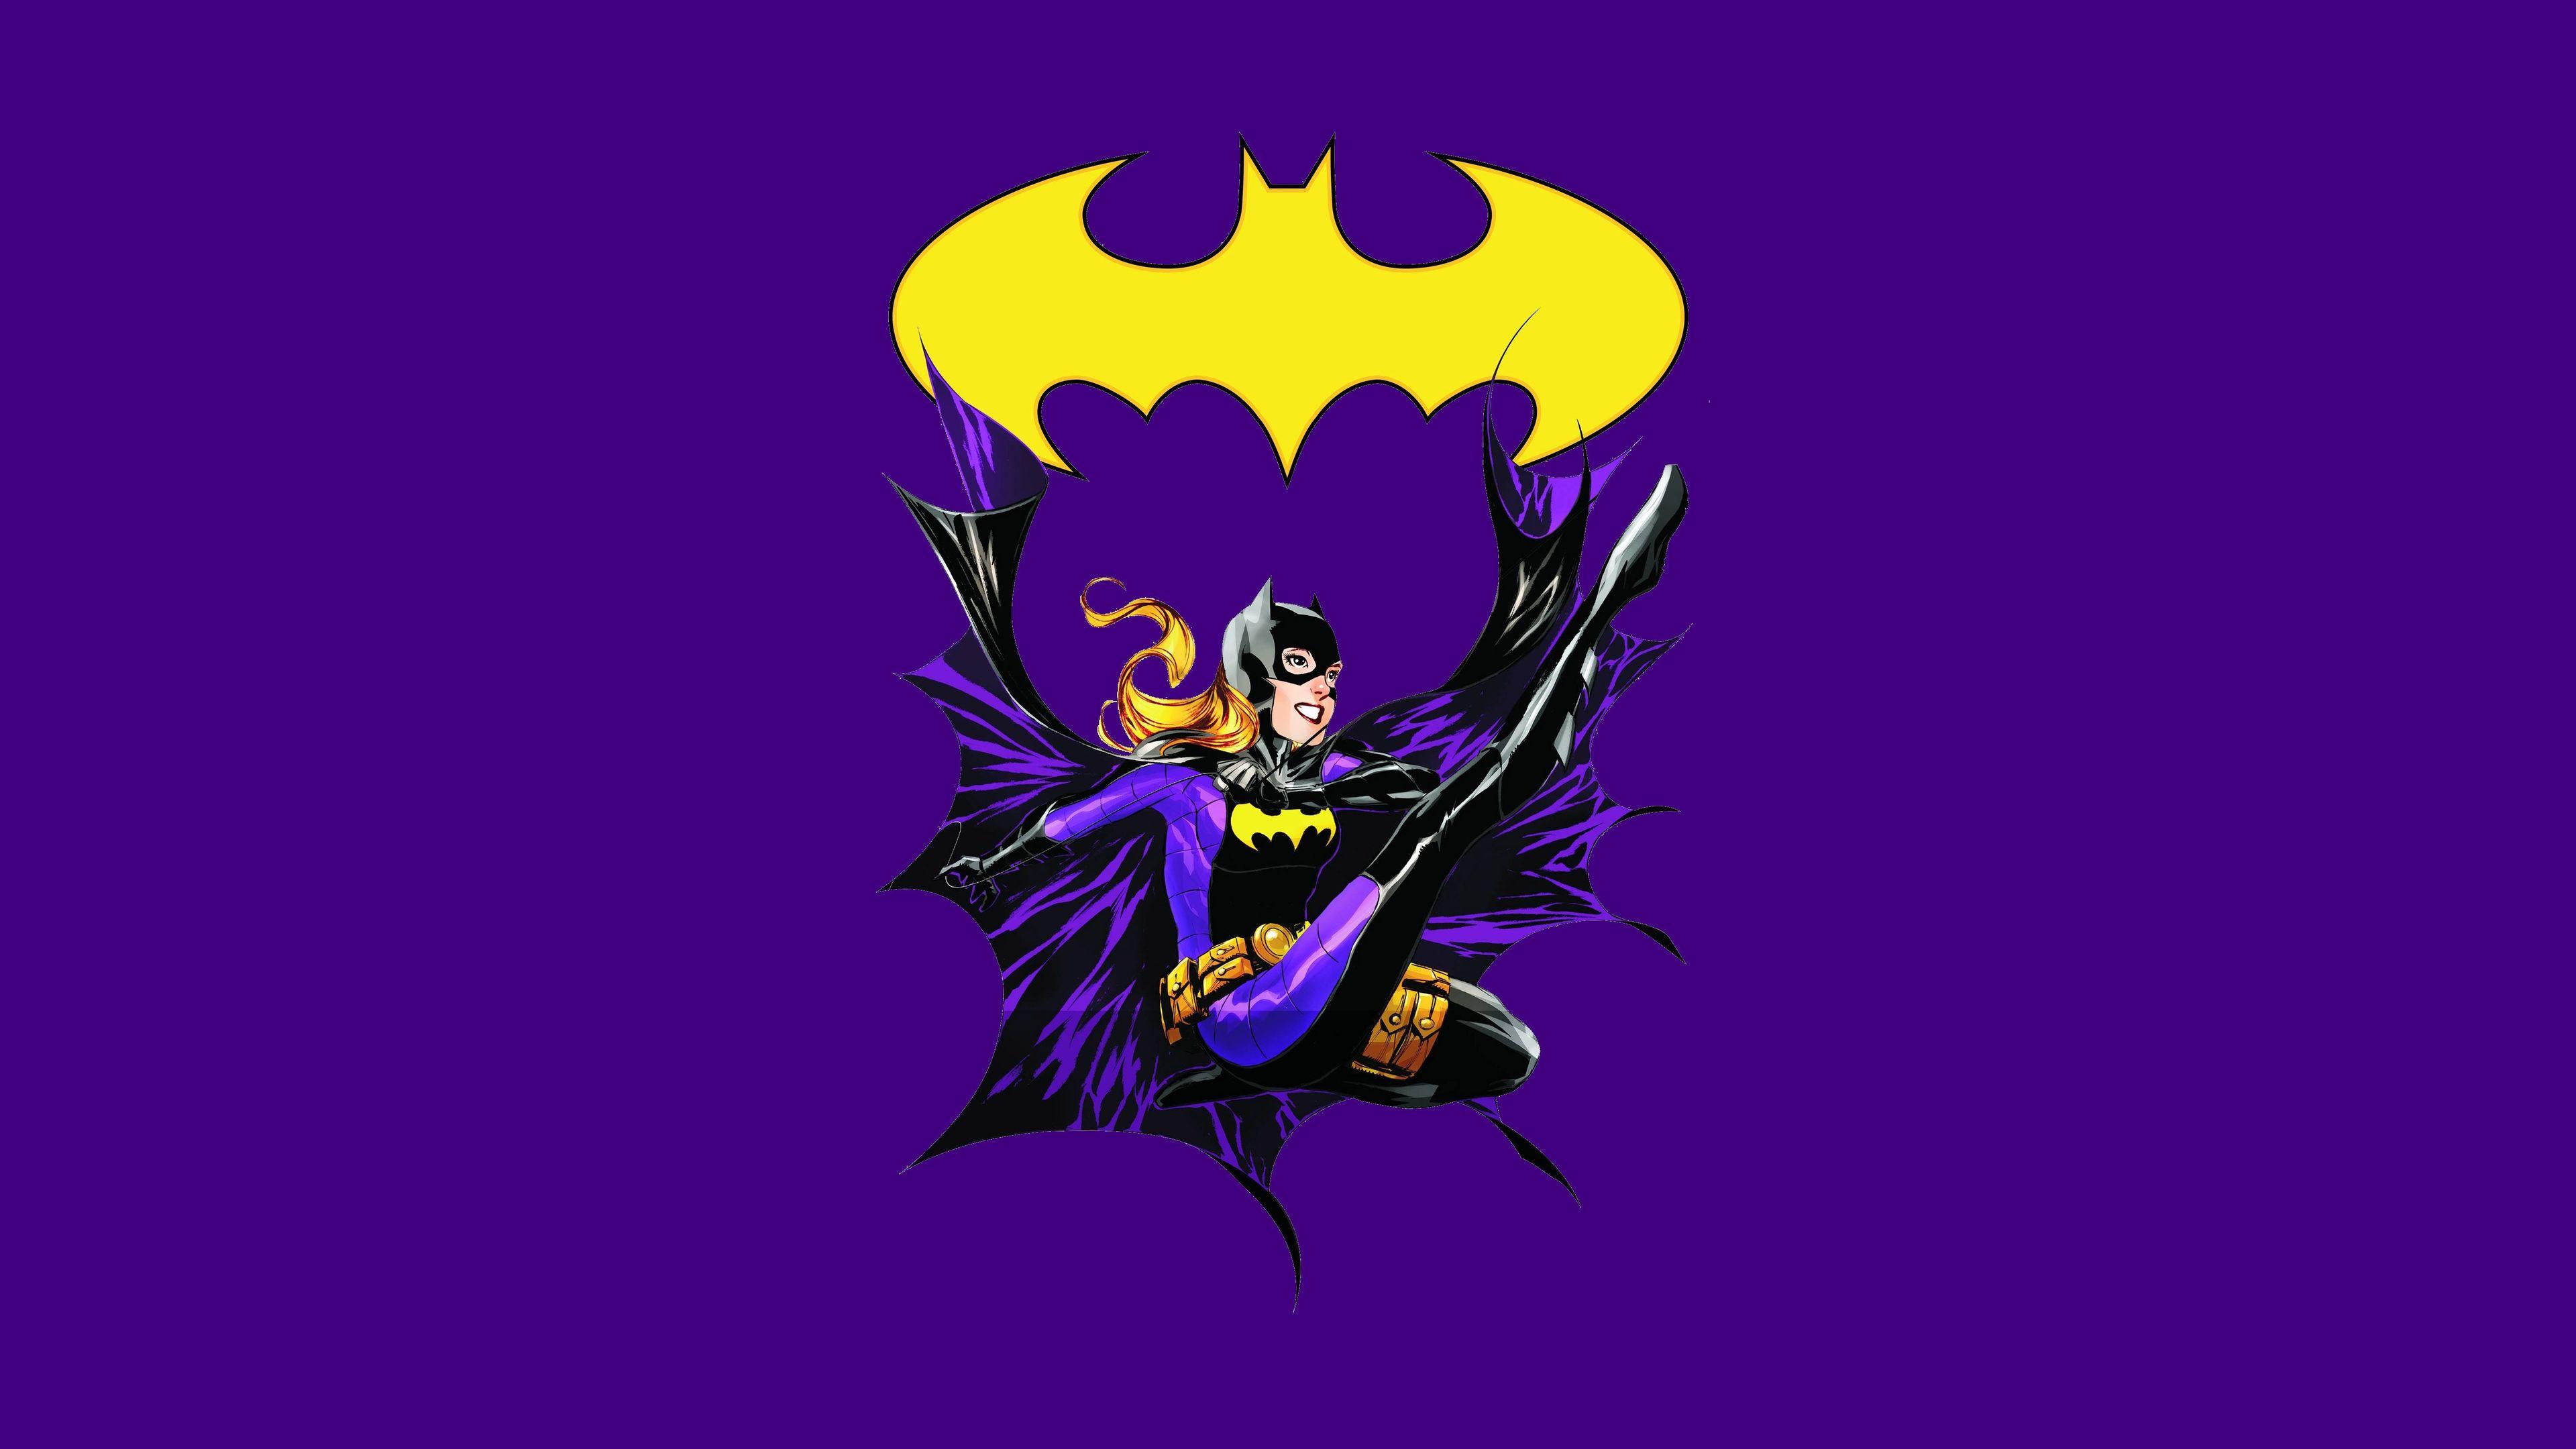 batwoman vibrant 4k 1547319545 - Batwoman Vibrant 4k - superheroes wallpapers, hd-wallpapers, digital art wallpapers, batwoman wallpapers, artwork wallpapers